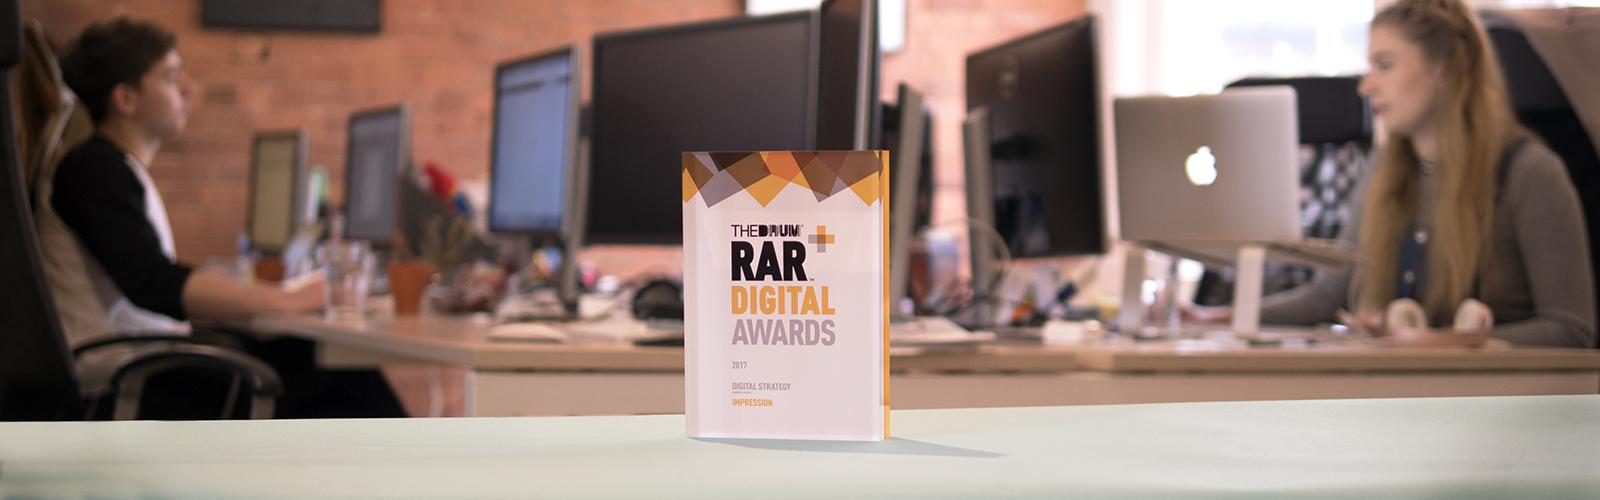 digital strategy award rar